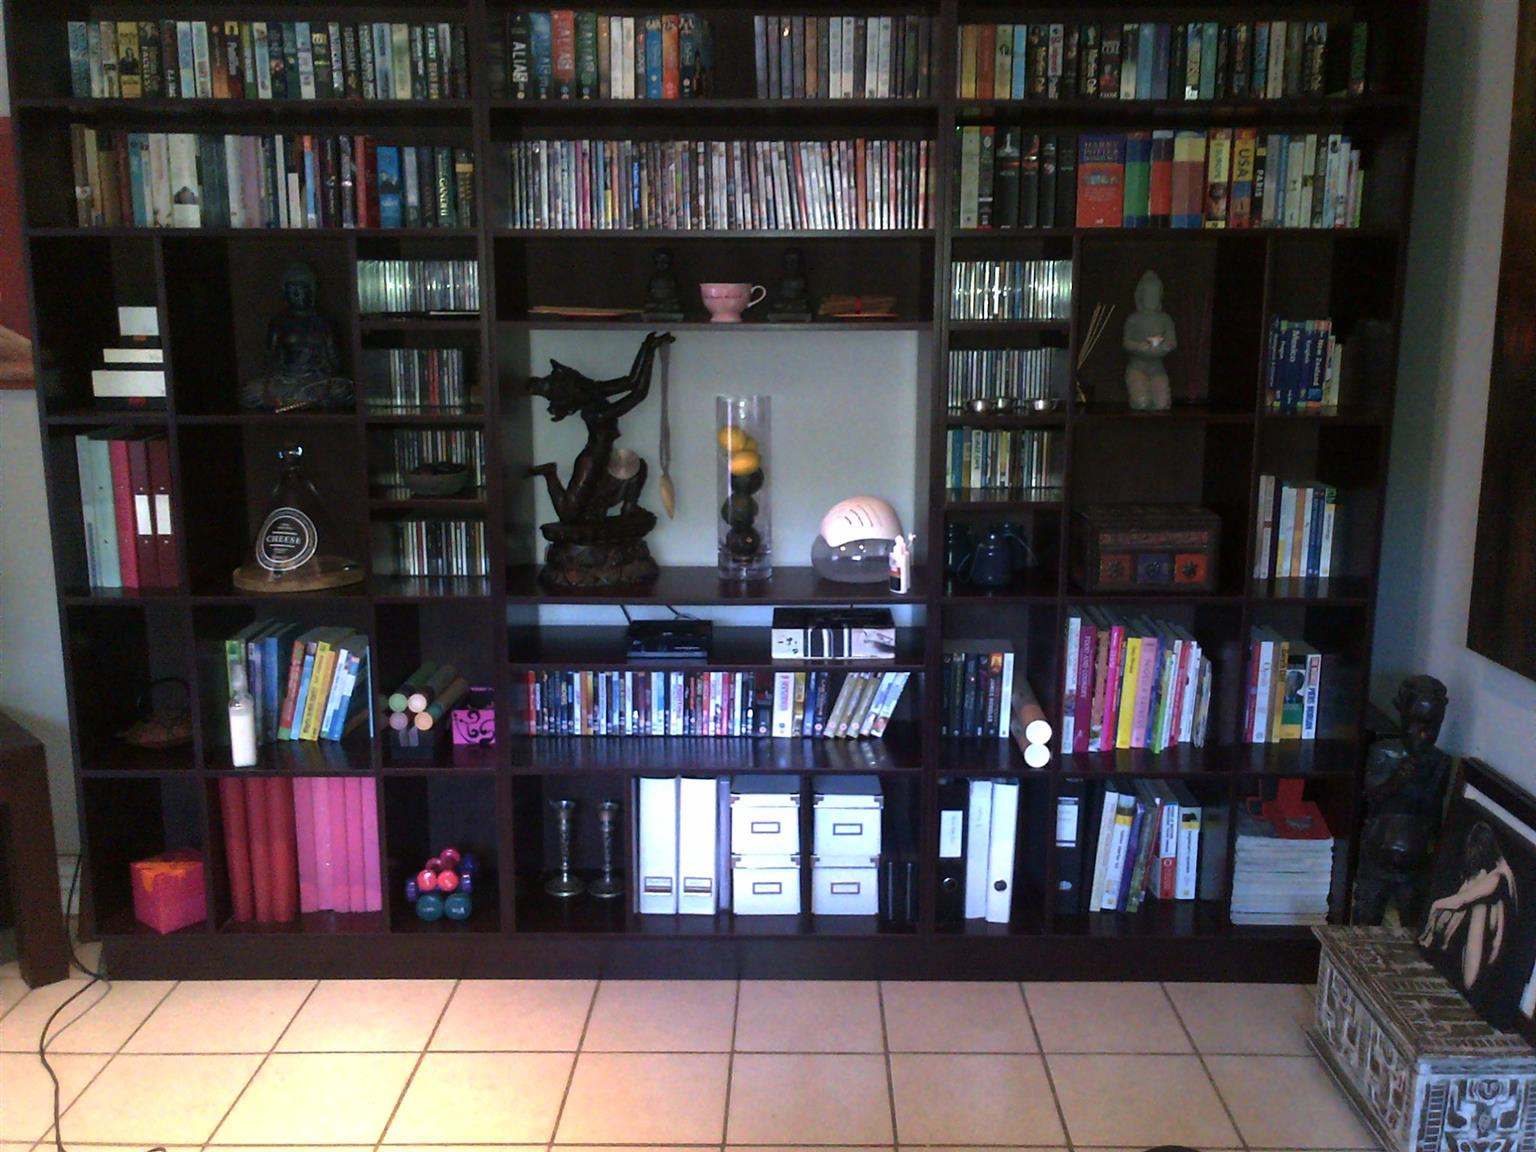 Wall Unit/Bookshelf